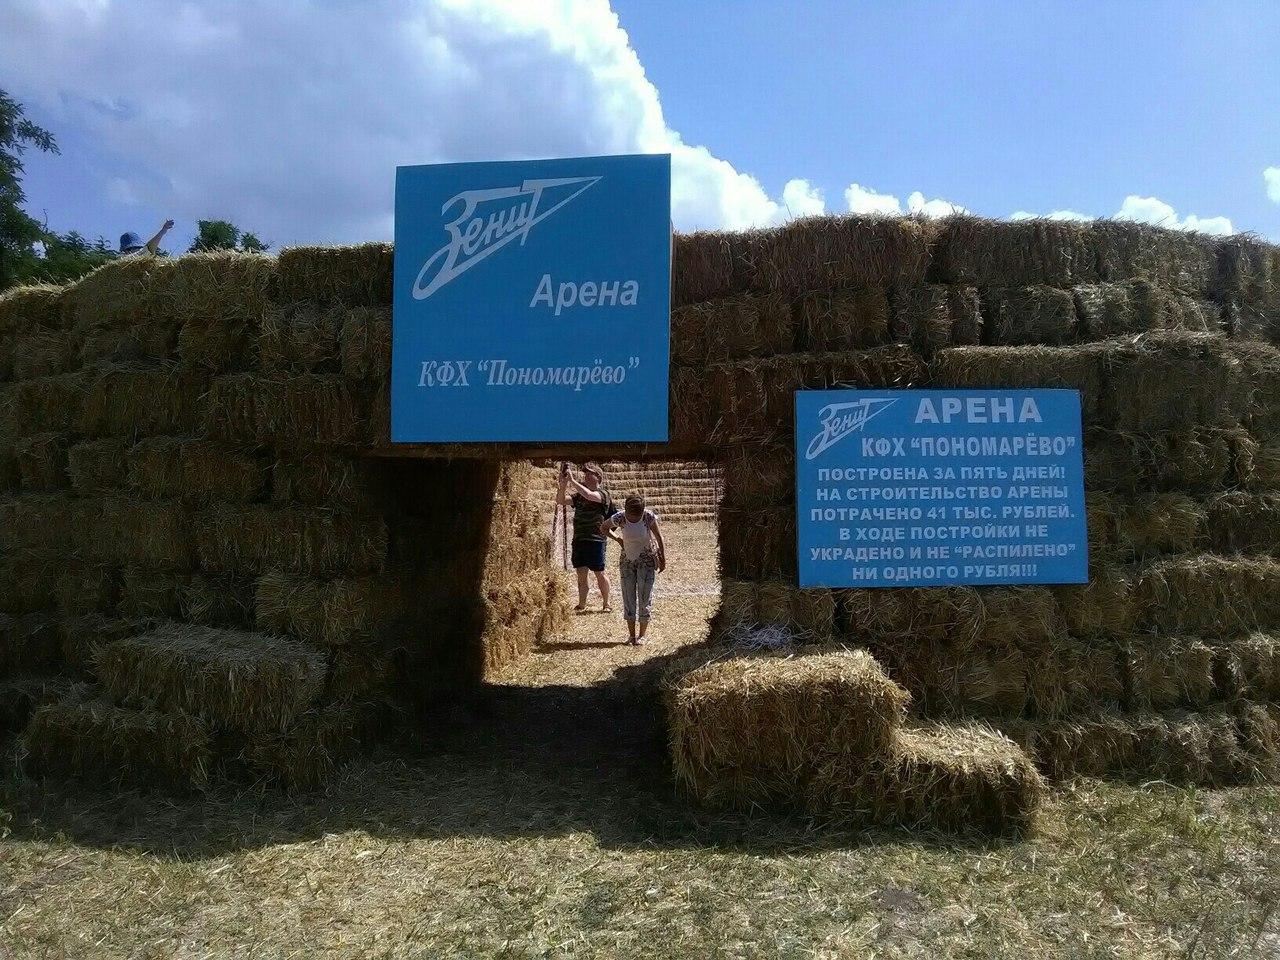 На Ставрополье построили «Зенит-Арену» из сена за пять дней - фото